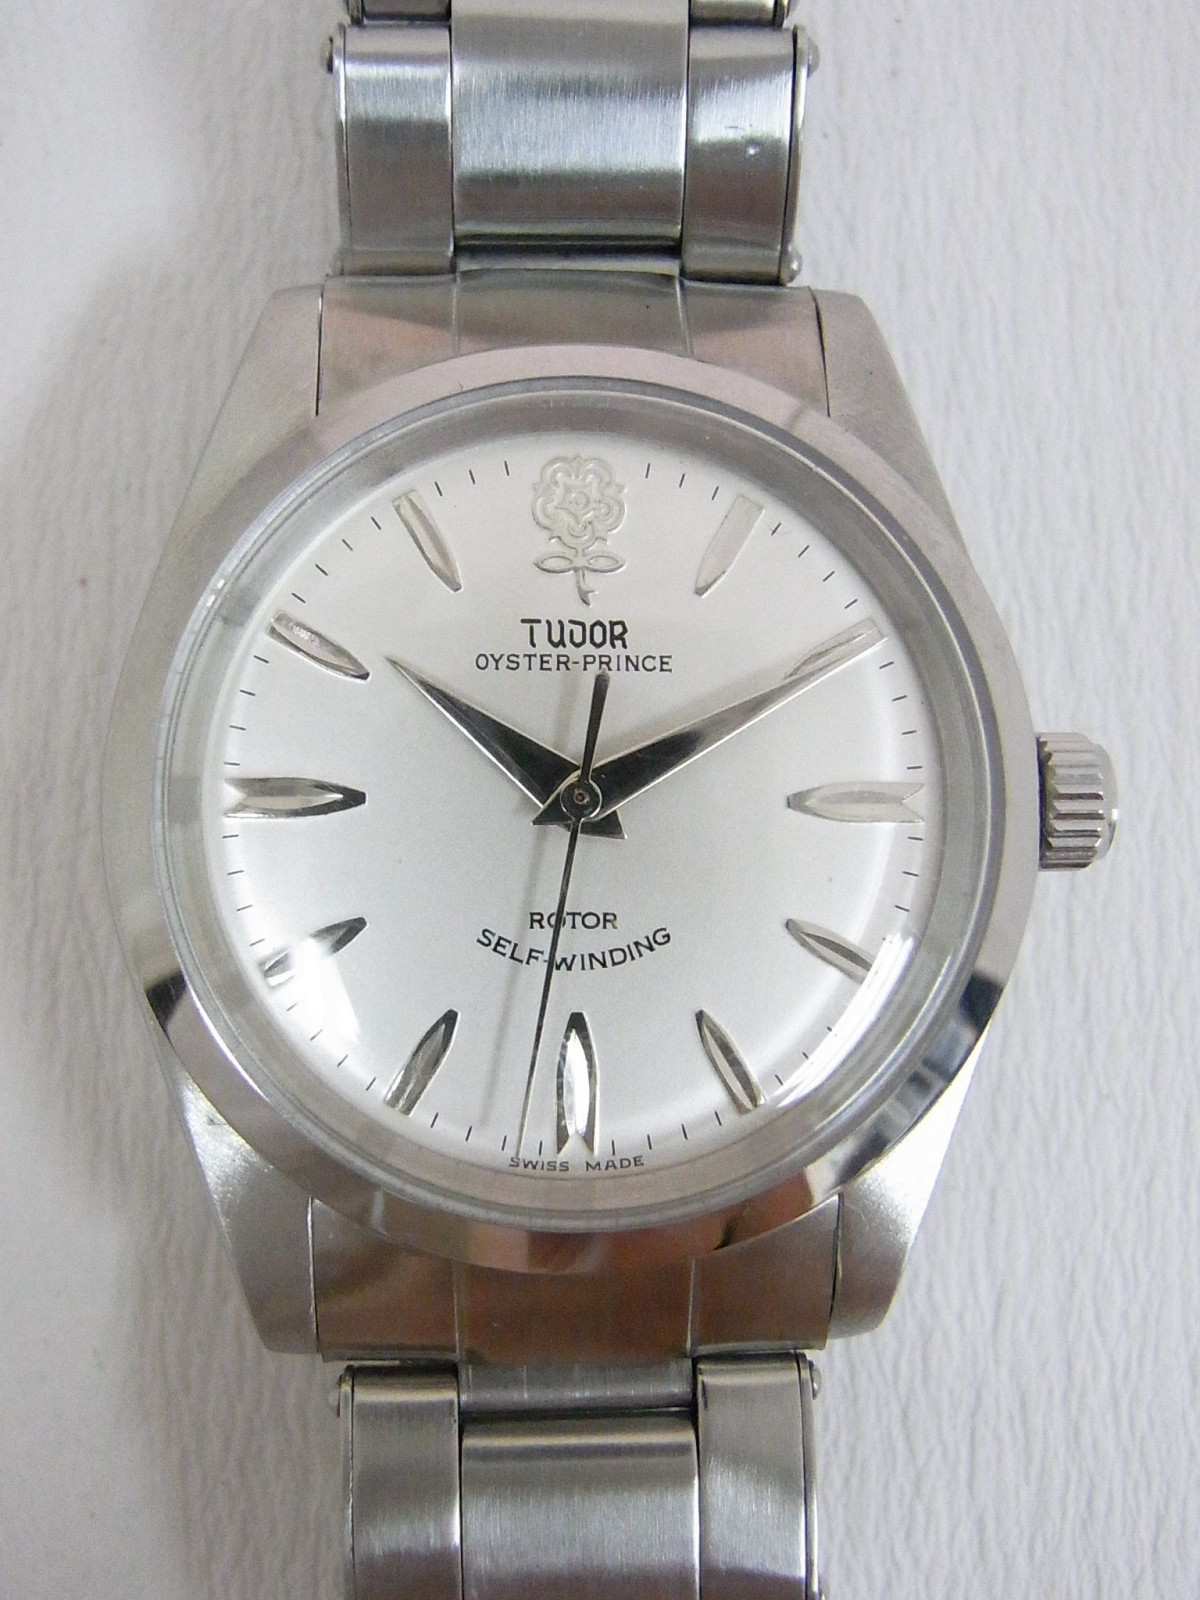 9583f1b8532 Tudor Oyster Prince relógio usados (€241) - Timepeaks